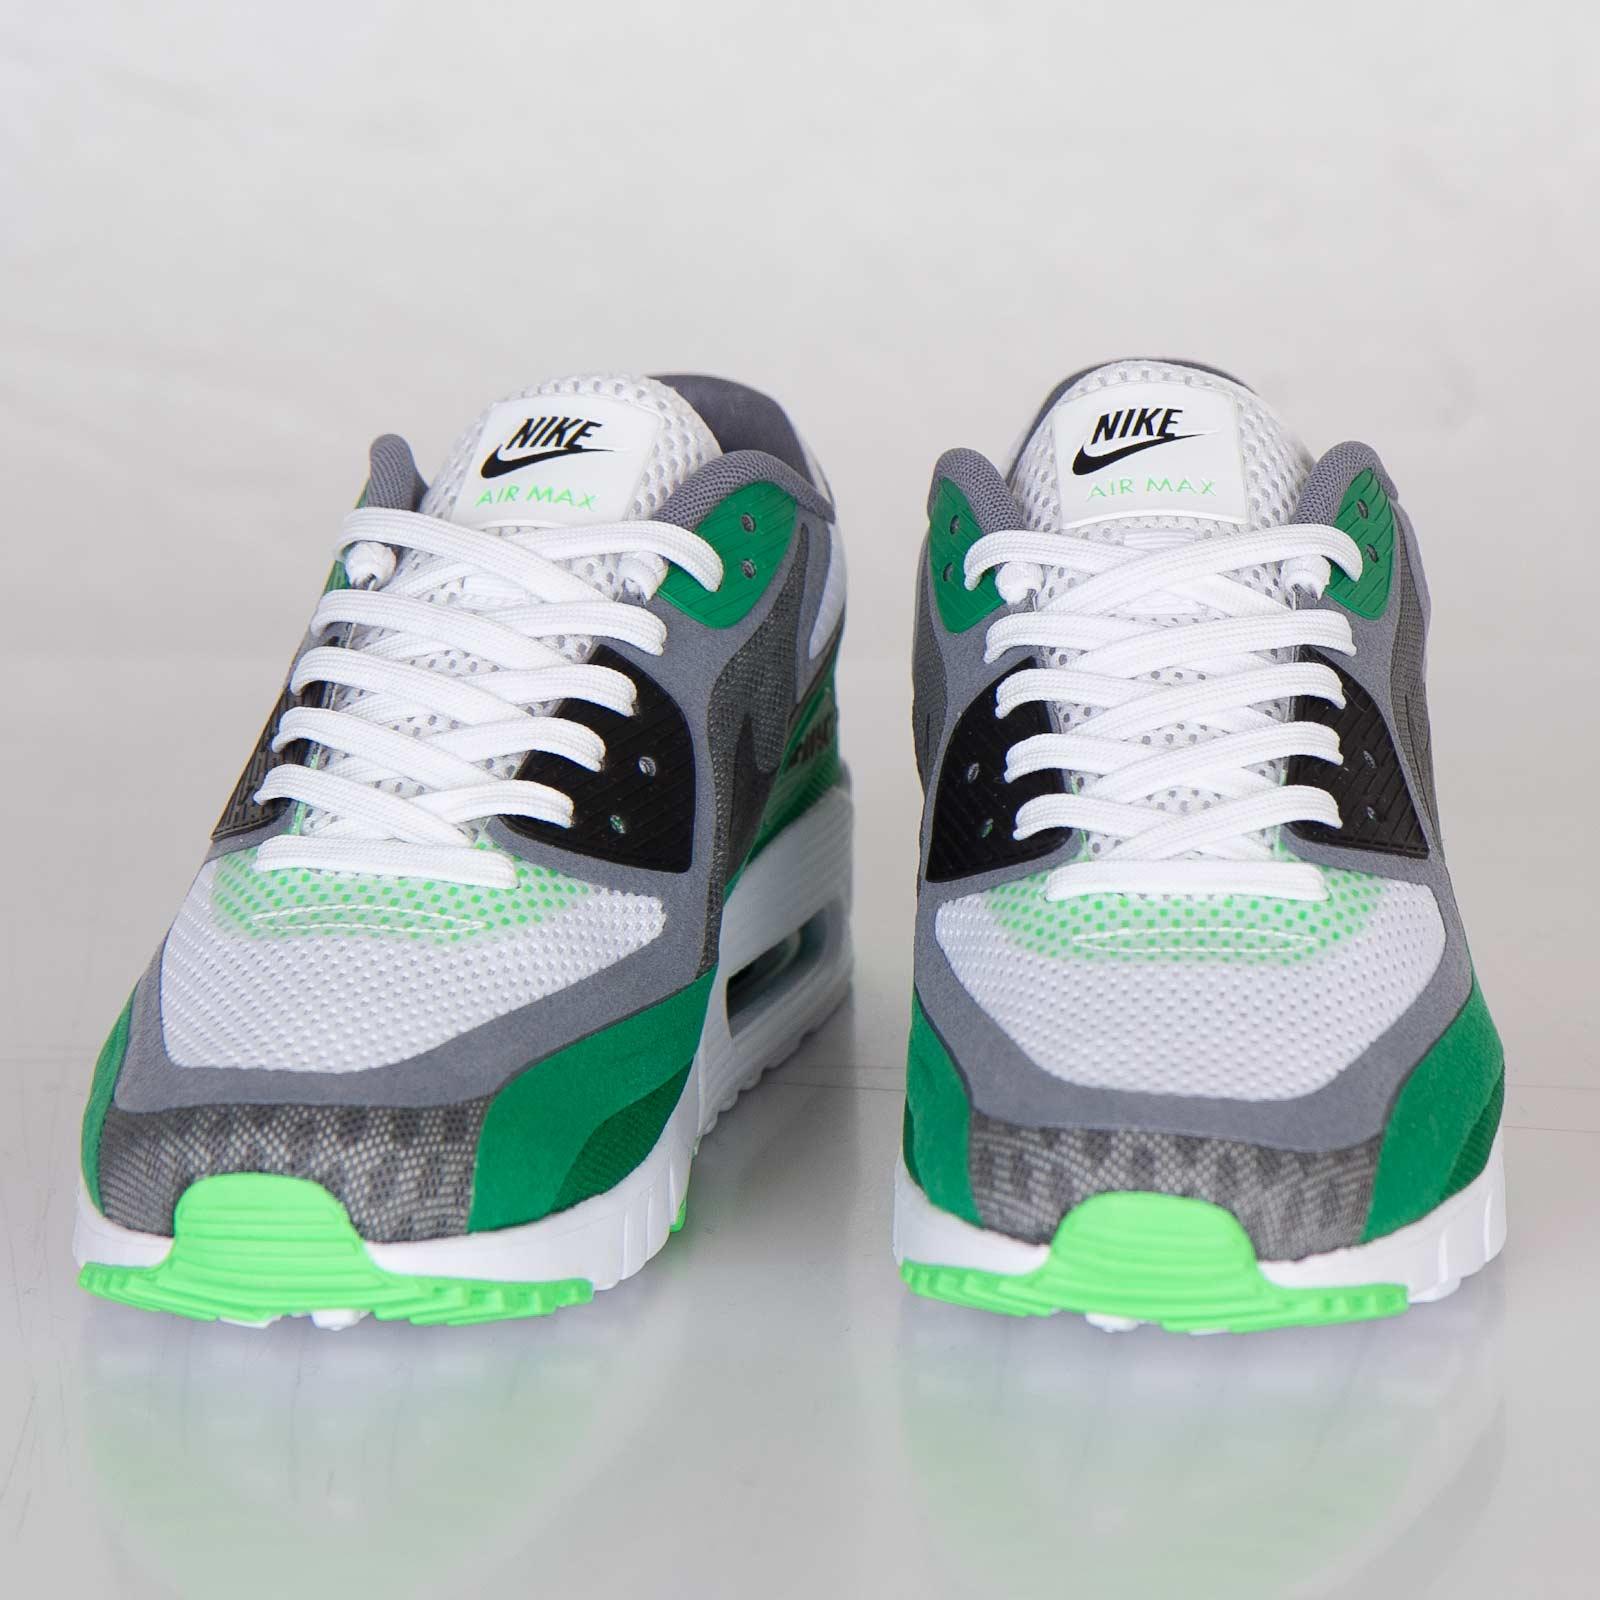 heiß Herren Poly Max Air Nike Joggers Gefeierten JoggersNike